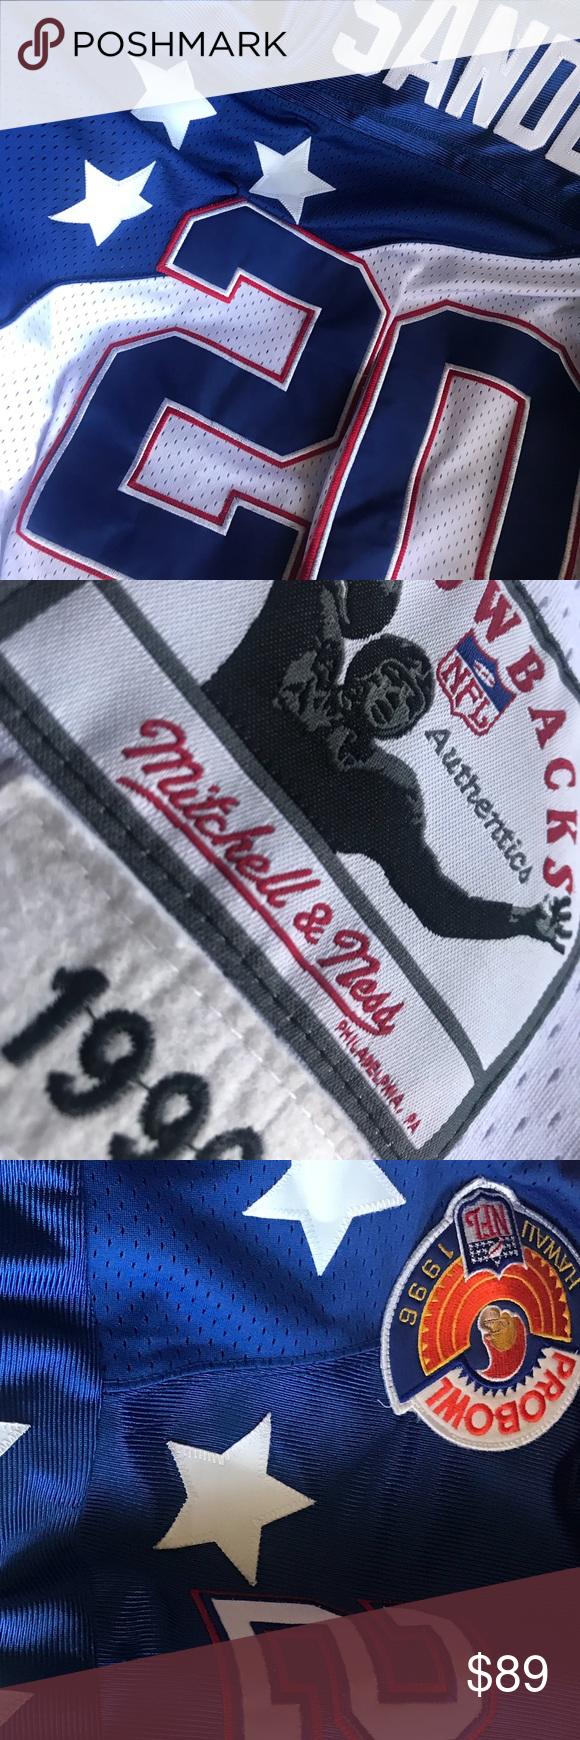 online retailer 1937e 3b703 NWOT! Barry Sanders 1996 Pro Bowl Jersey Size 52 MITCHELL ...